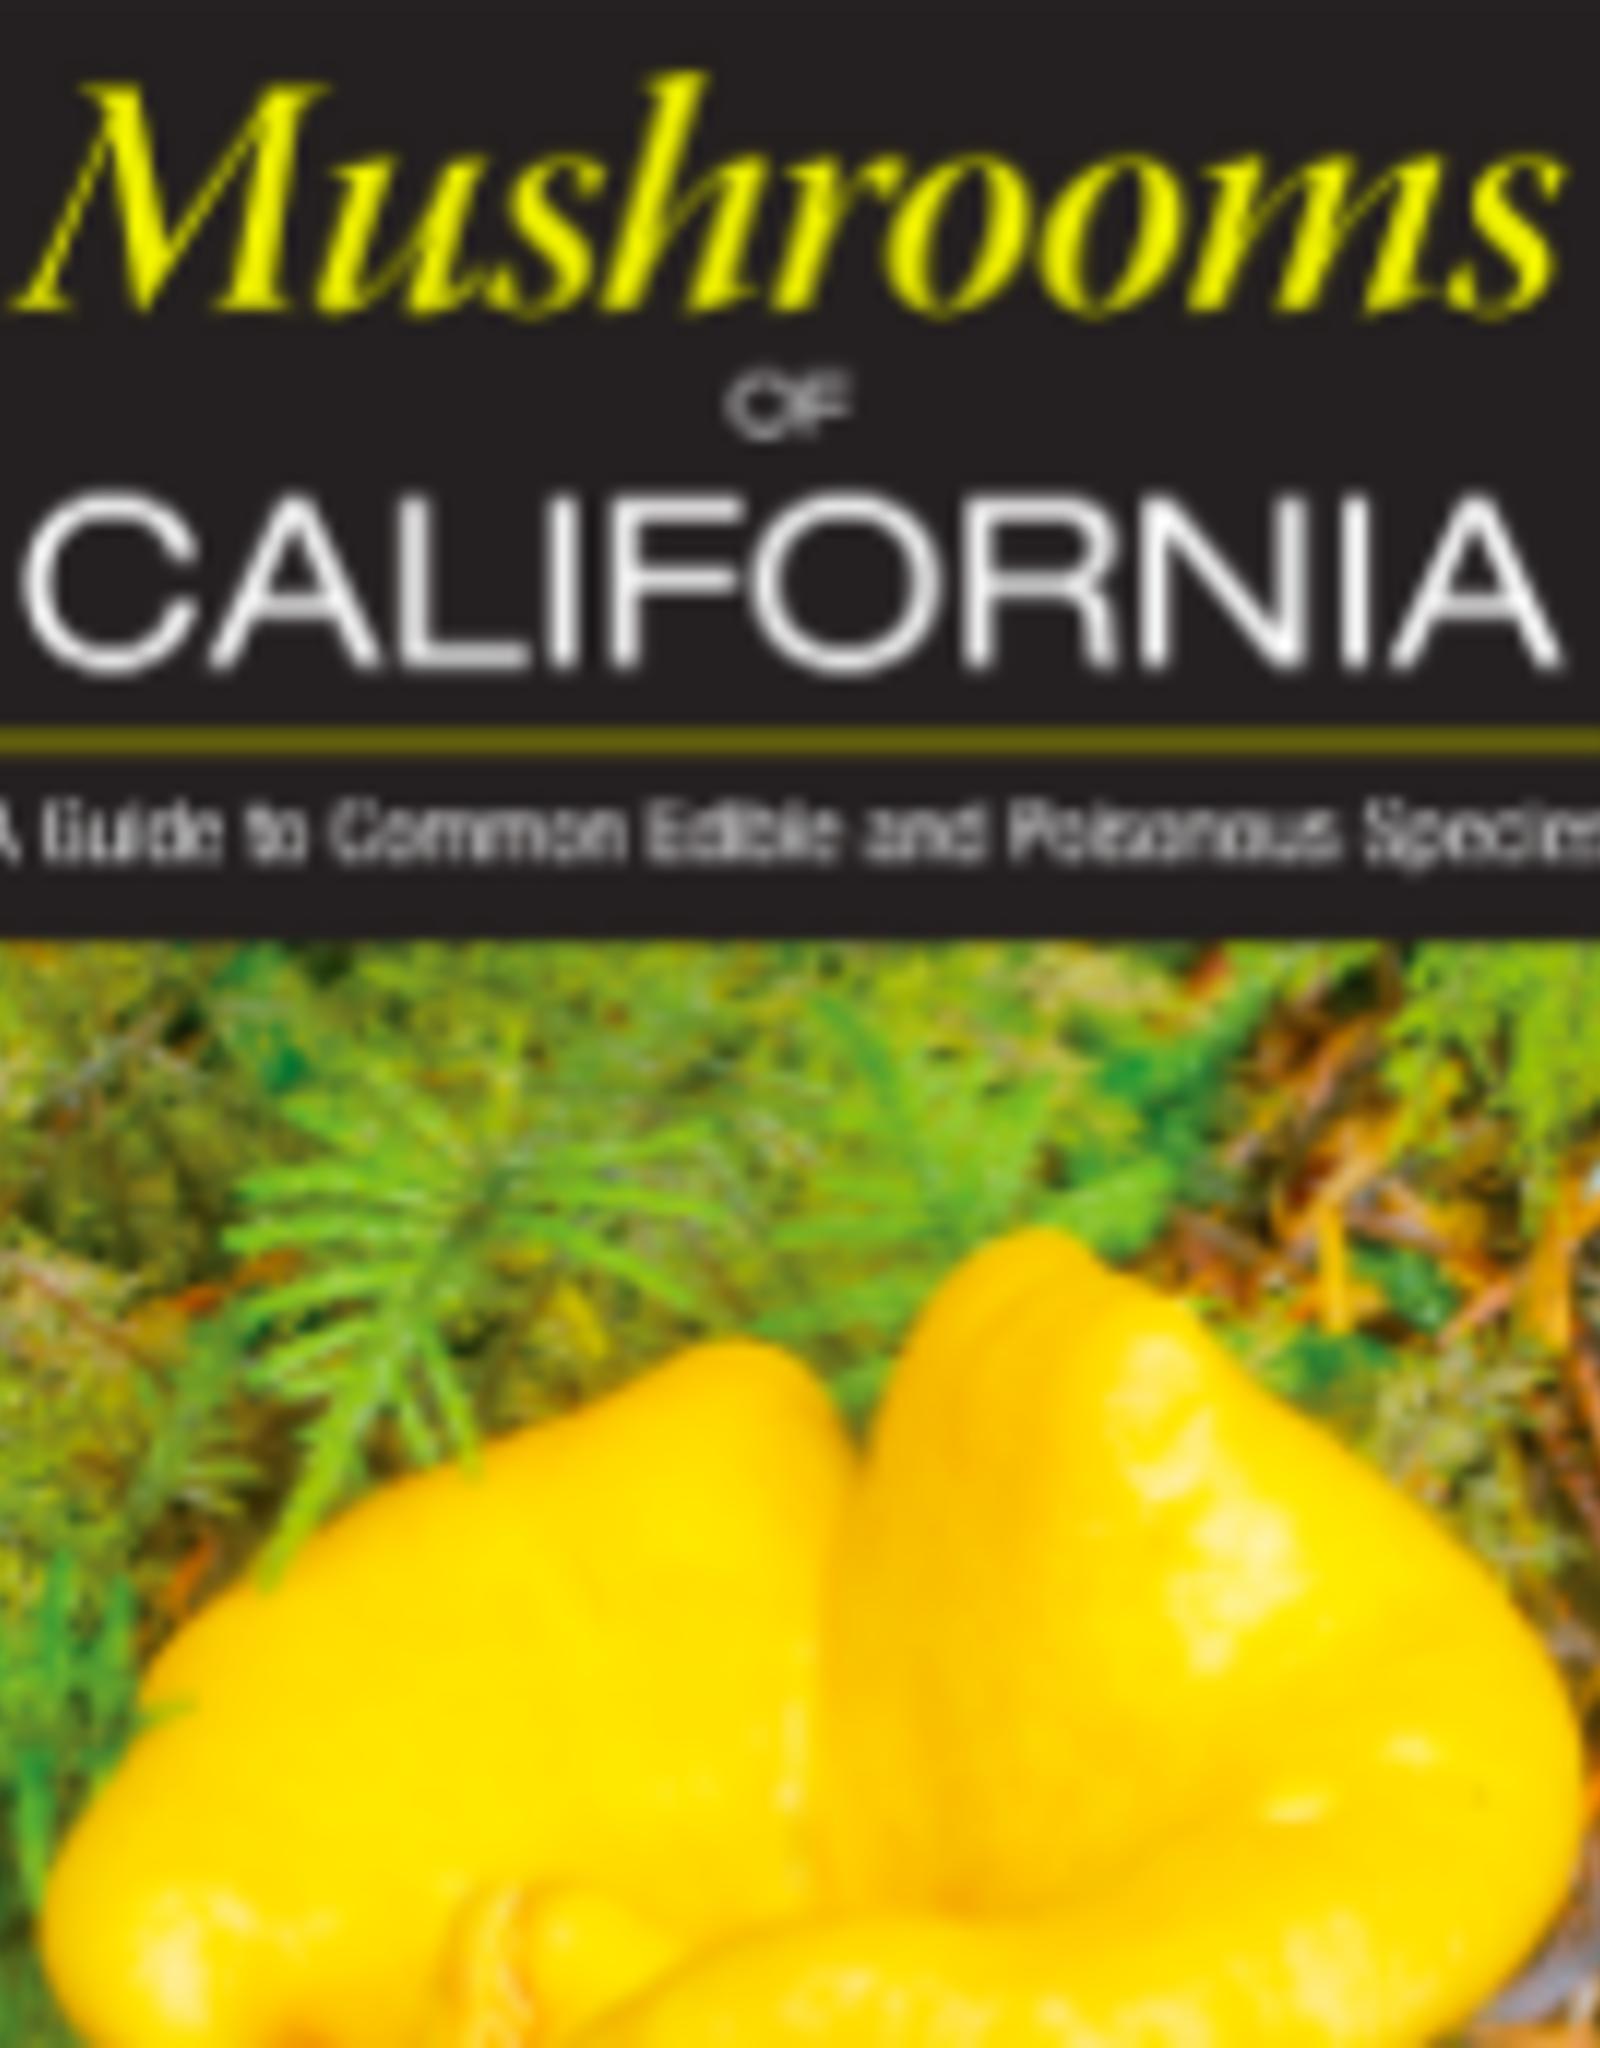 Mushrooms of California